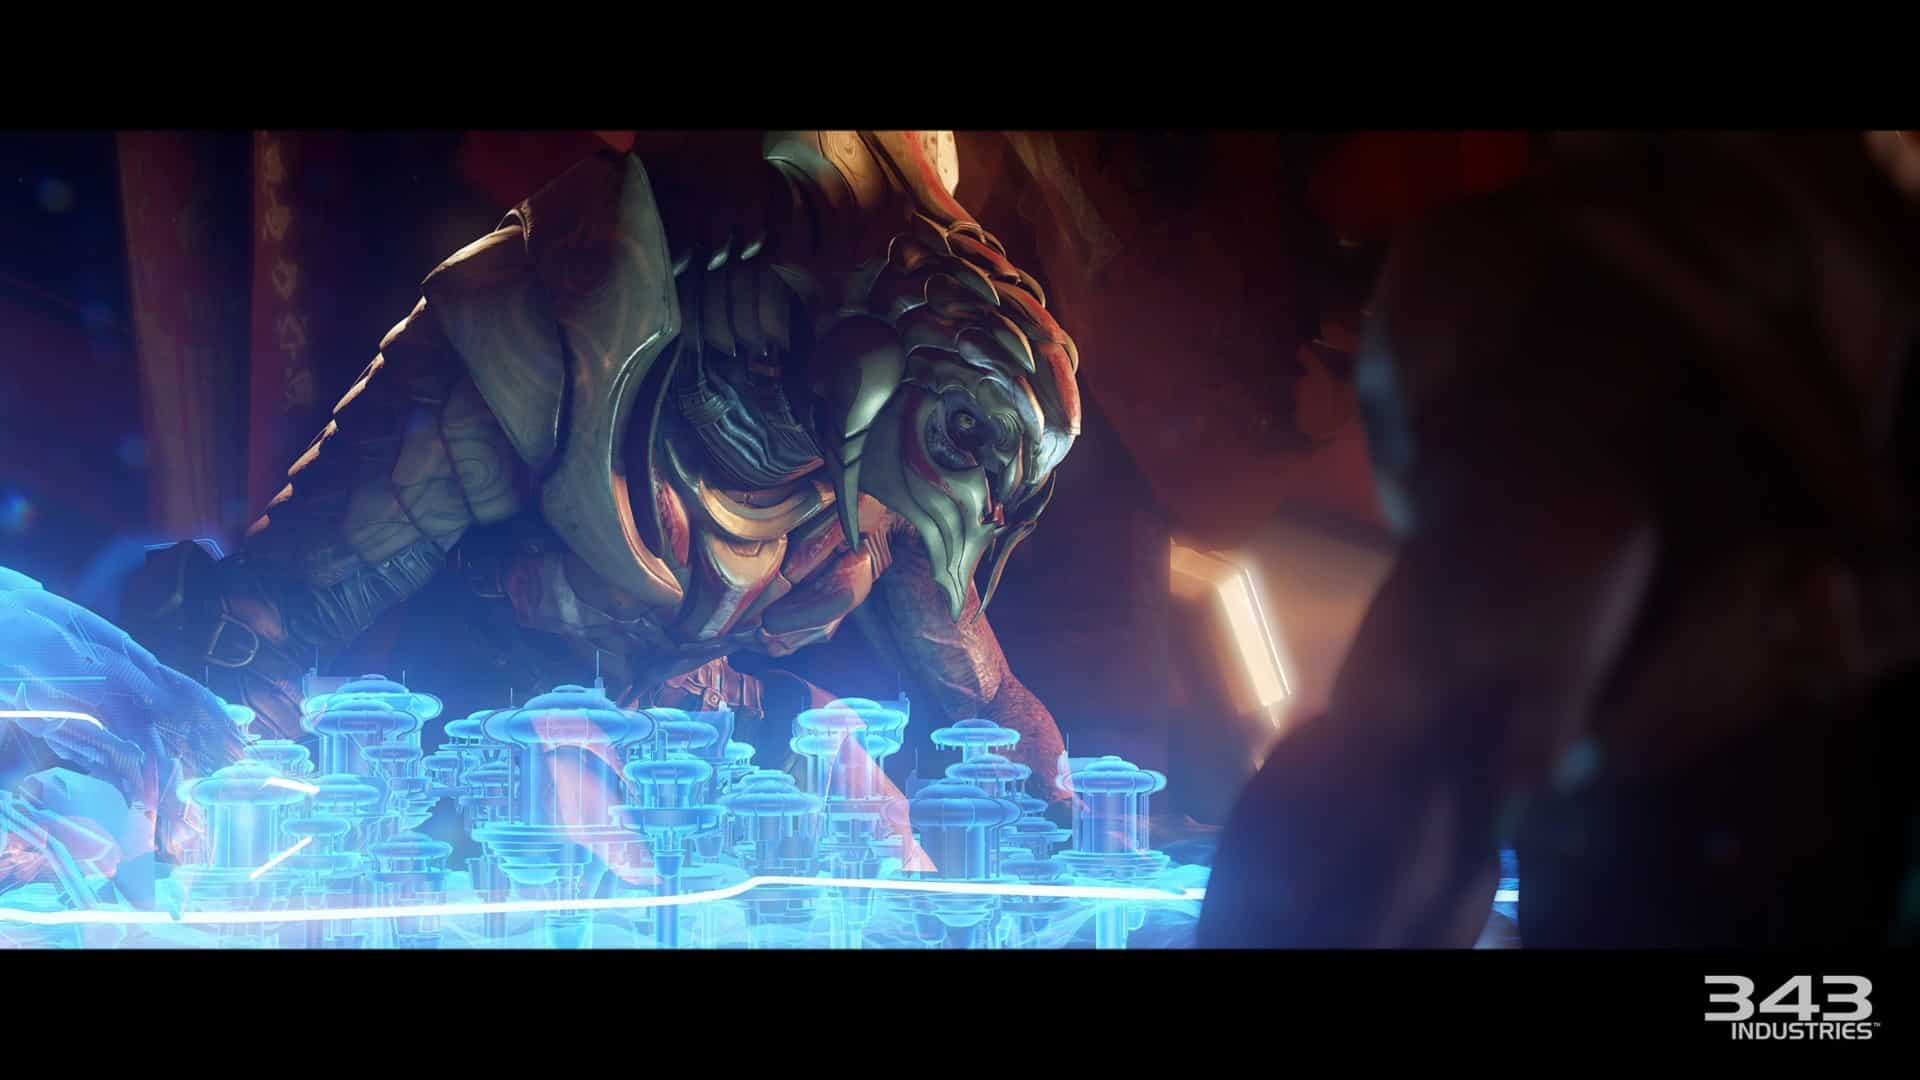 Halo Arbiter impact on franchise game design narrative storytelling religion themes character development Halo 2 Halo 5 343 Industries Bungie